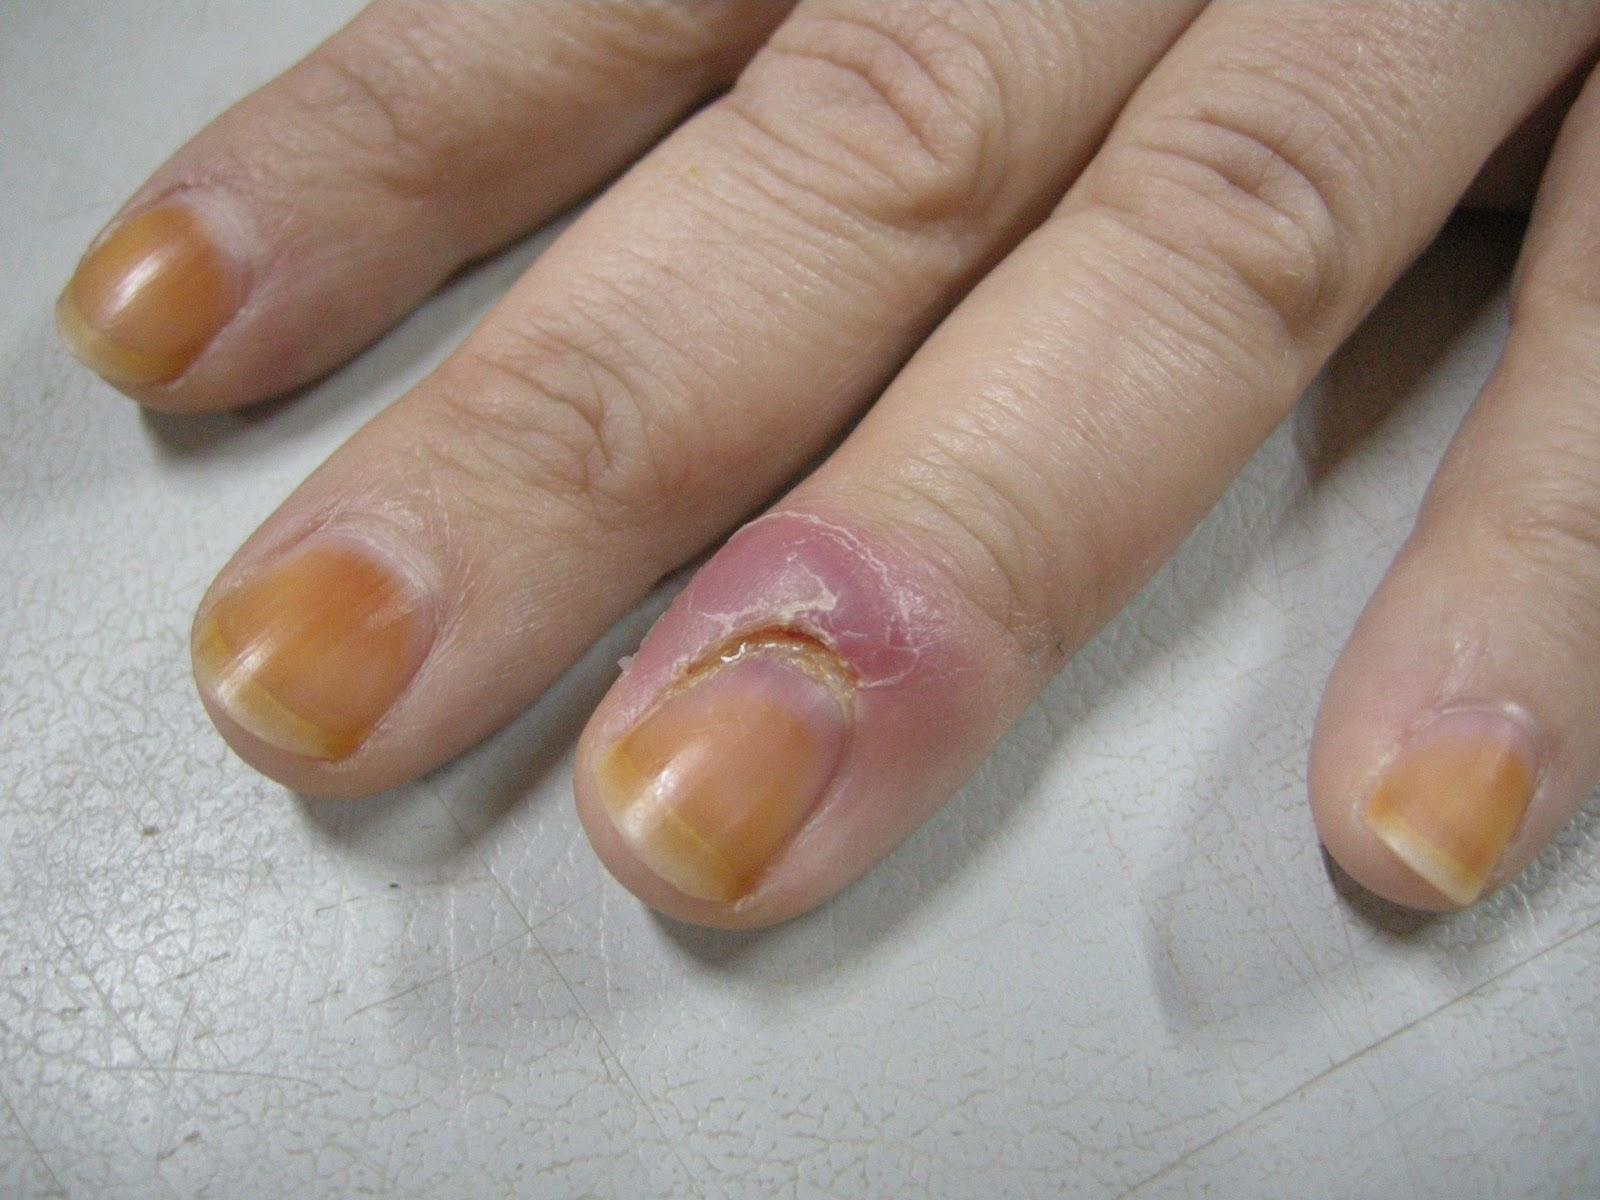 Cuticle Infection Paronychia